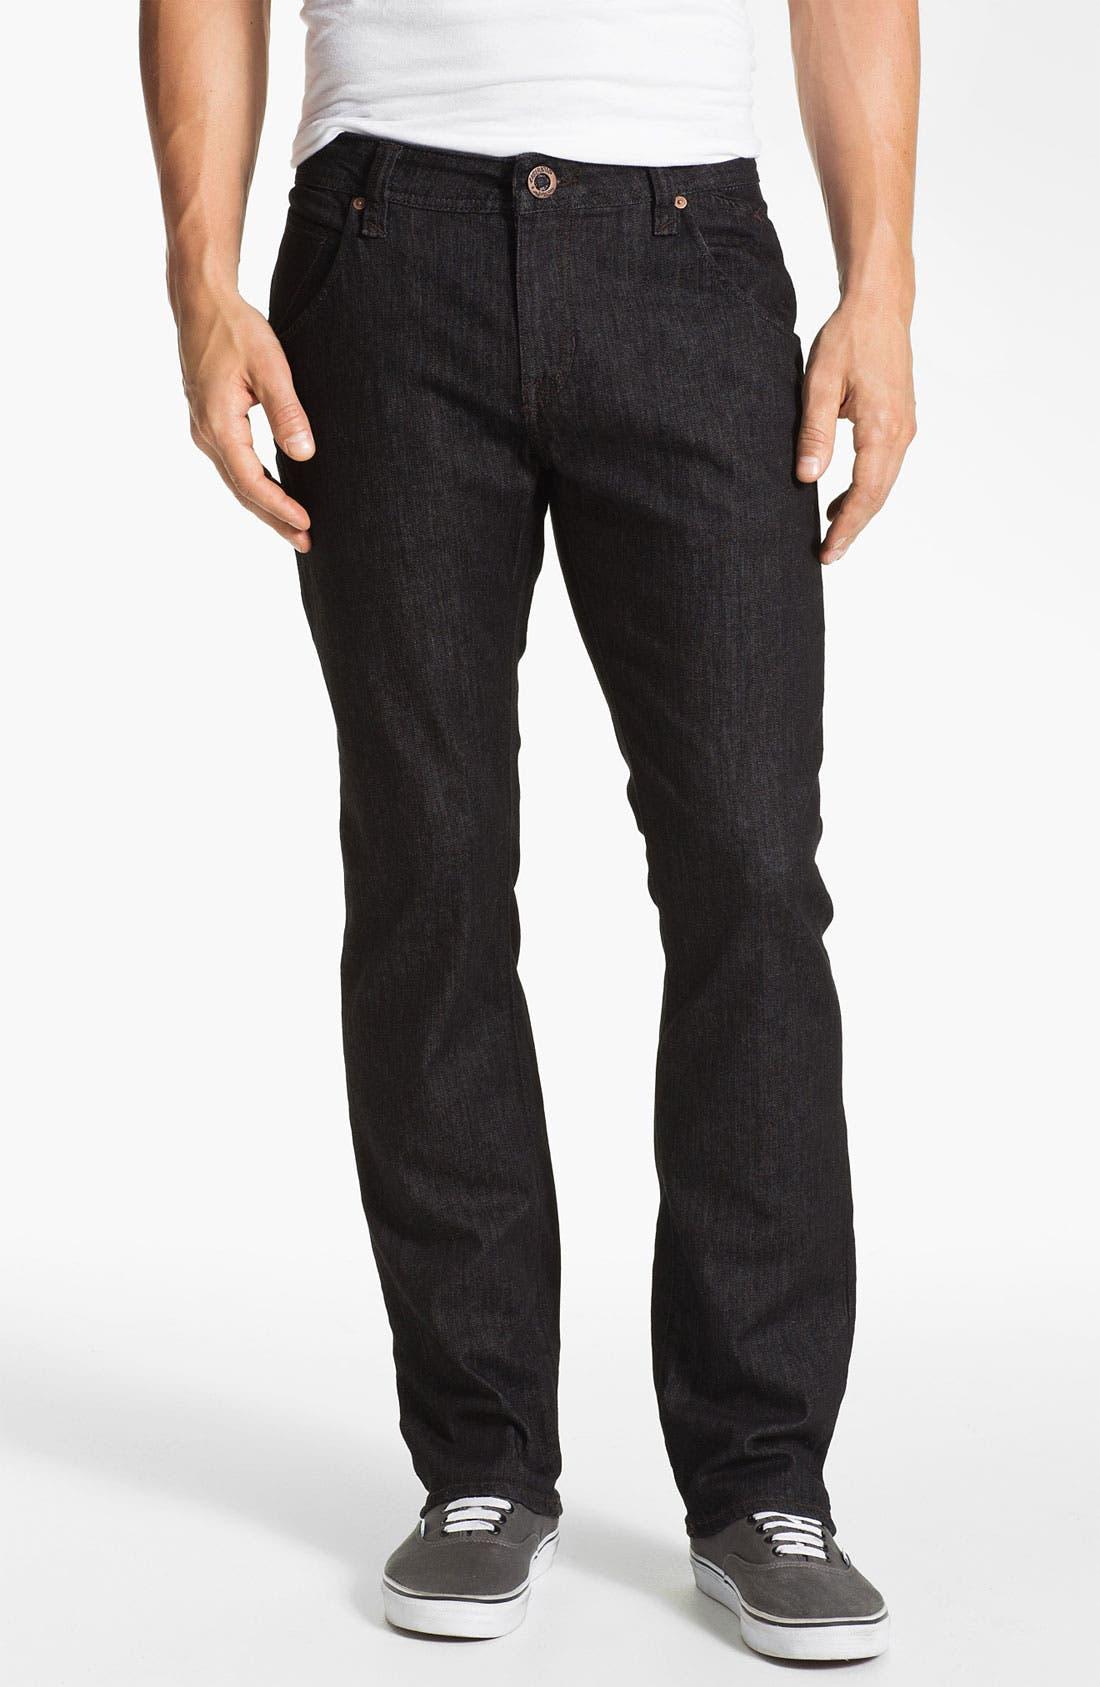 VOLCOM,                             'Nova' Slim Straight Leg Jeans,                             Alternate thumbnail 2, color,                             001